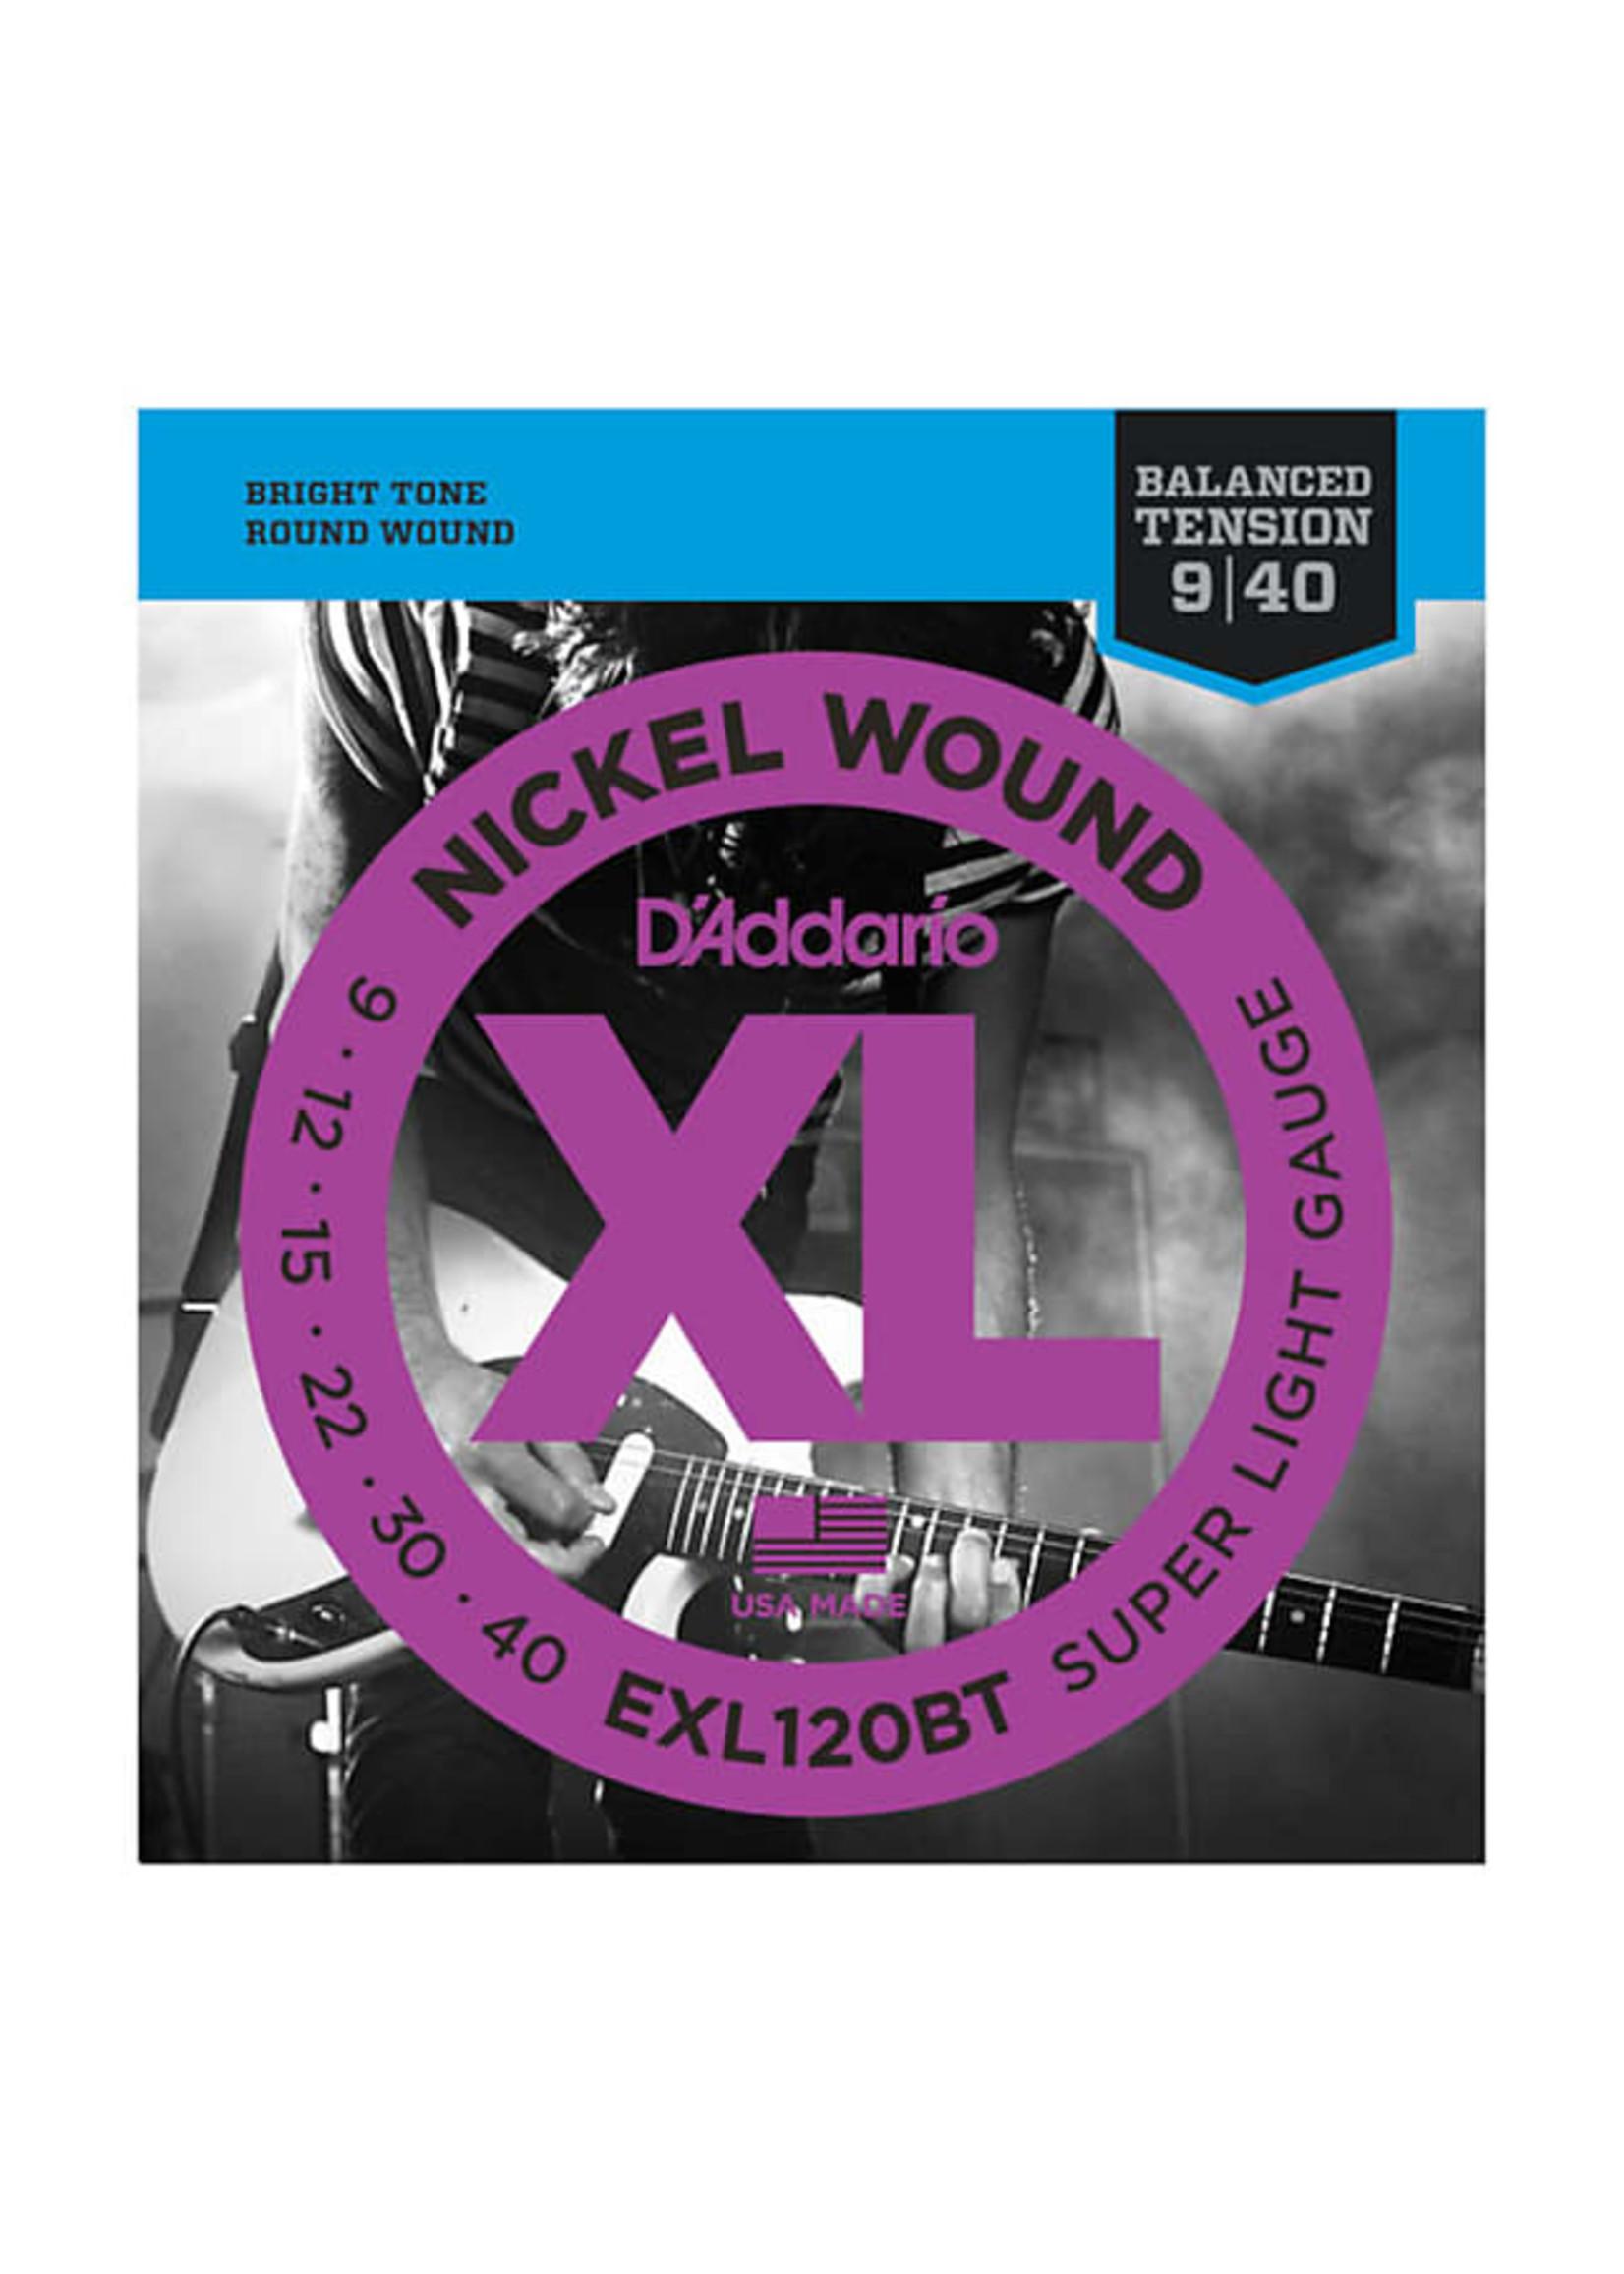 D'Addario D'Addario EXL120BT 9-40 Electric Guitar Strings